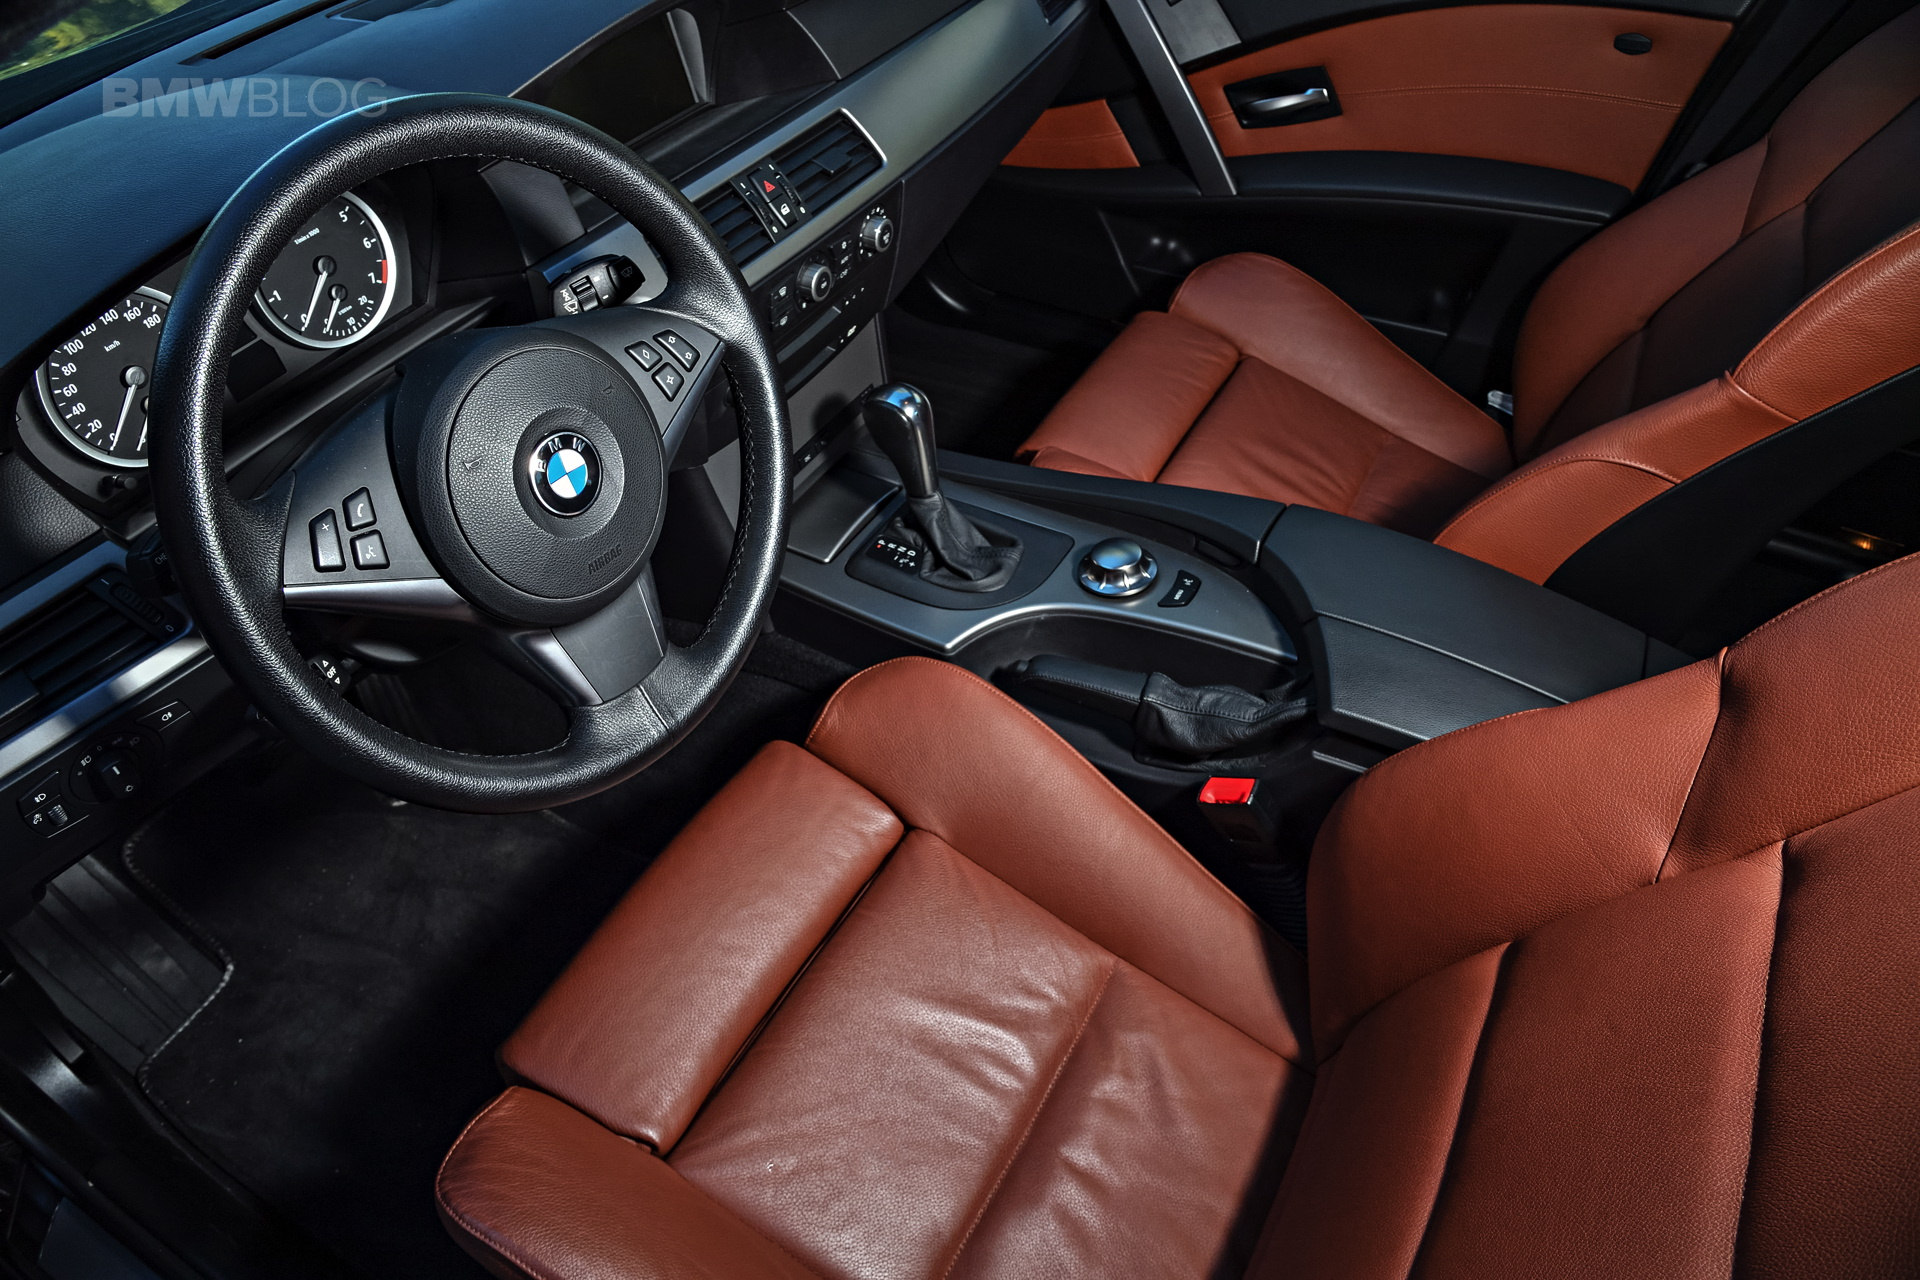 BMW E60 5 Series images 16